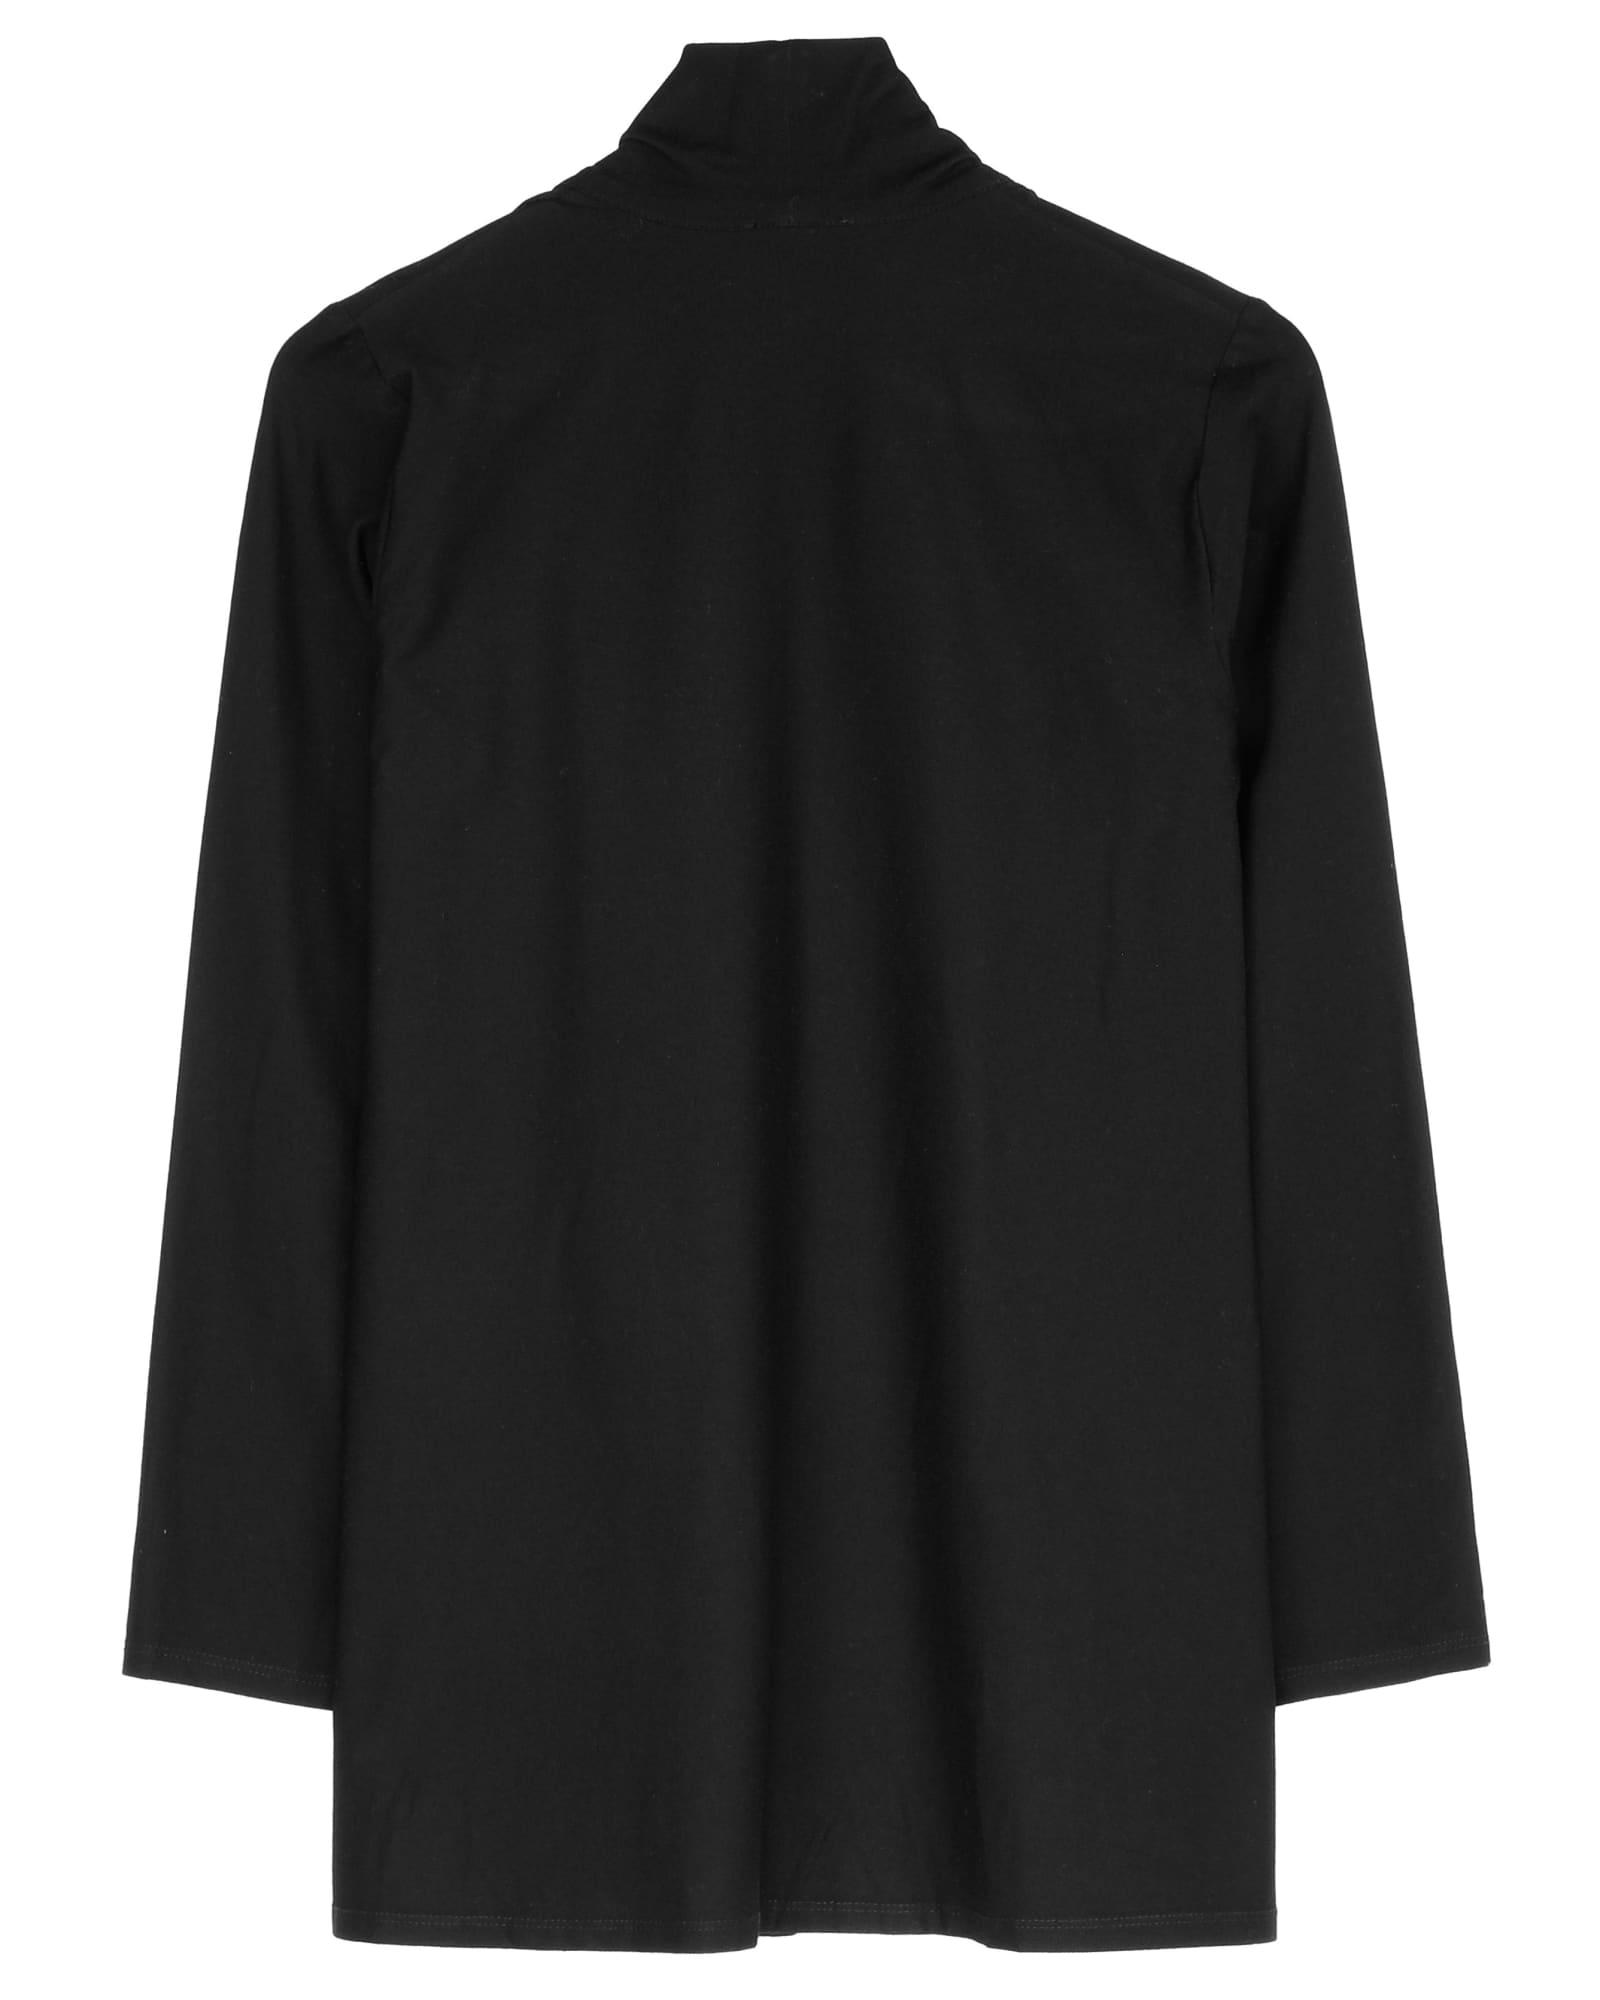 Main product image: rear